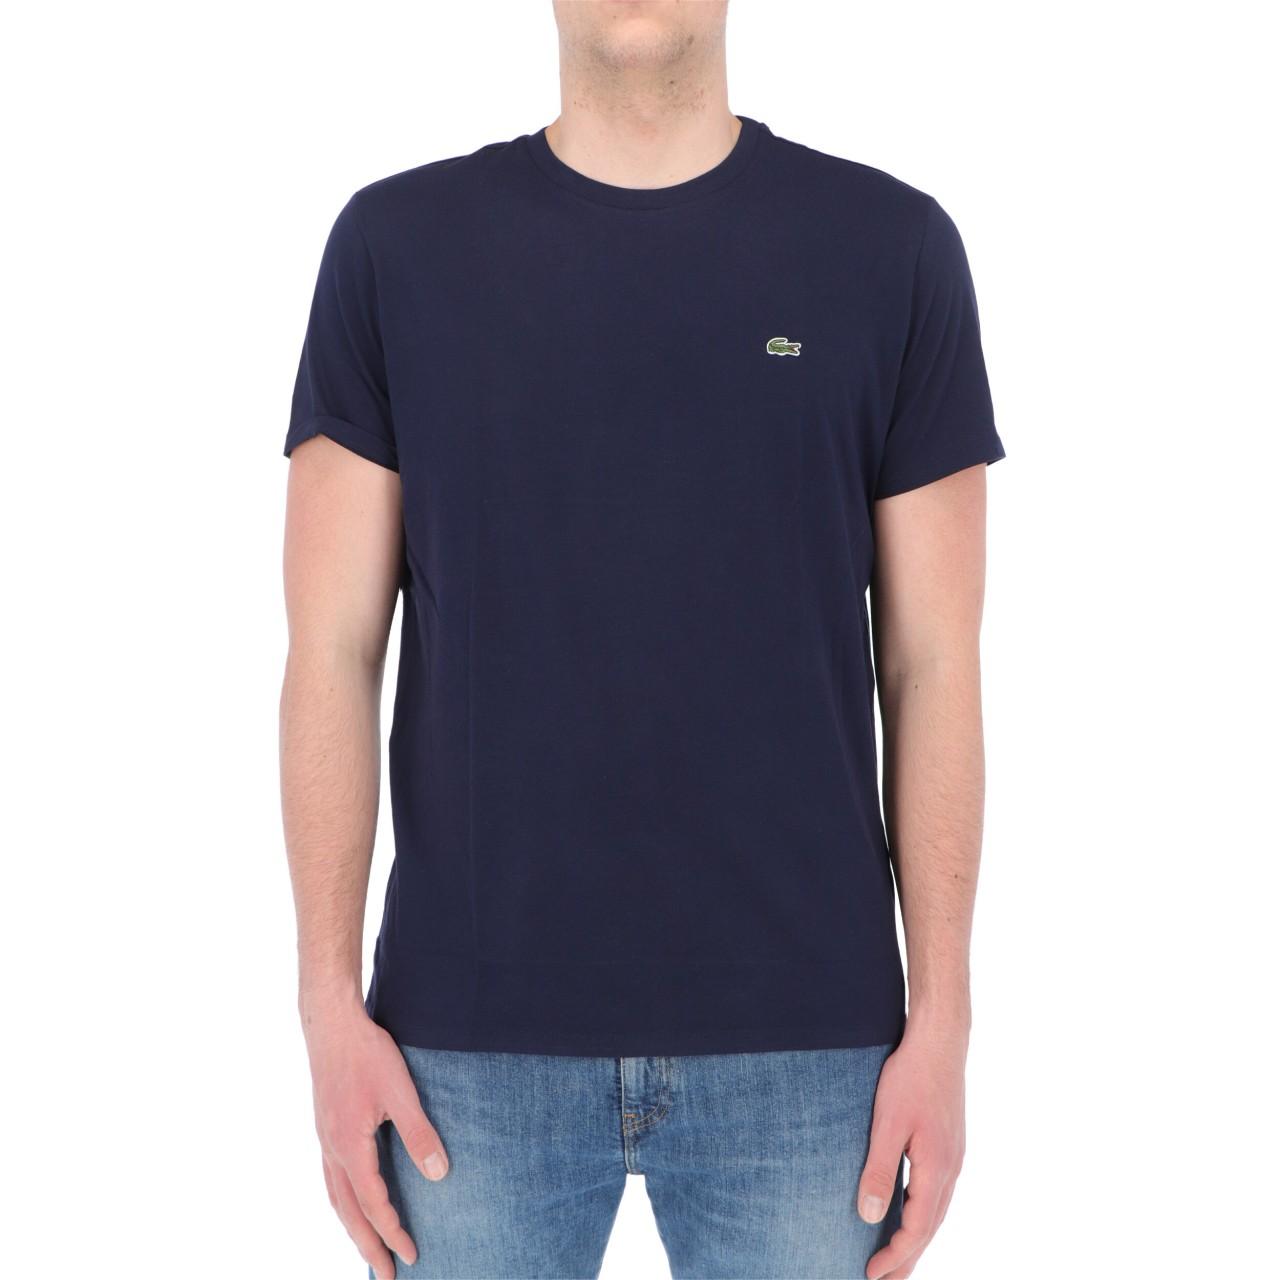 Lacoste Uomo Tshirt Lacoste Uomo Th6709 Classic Logo 6709P